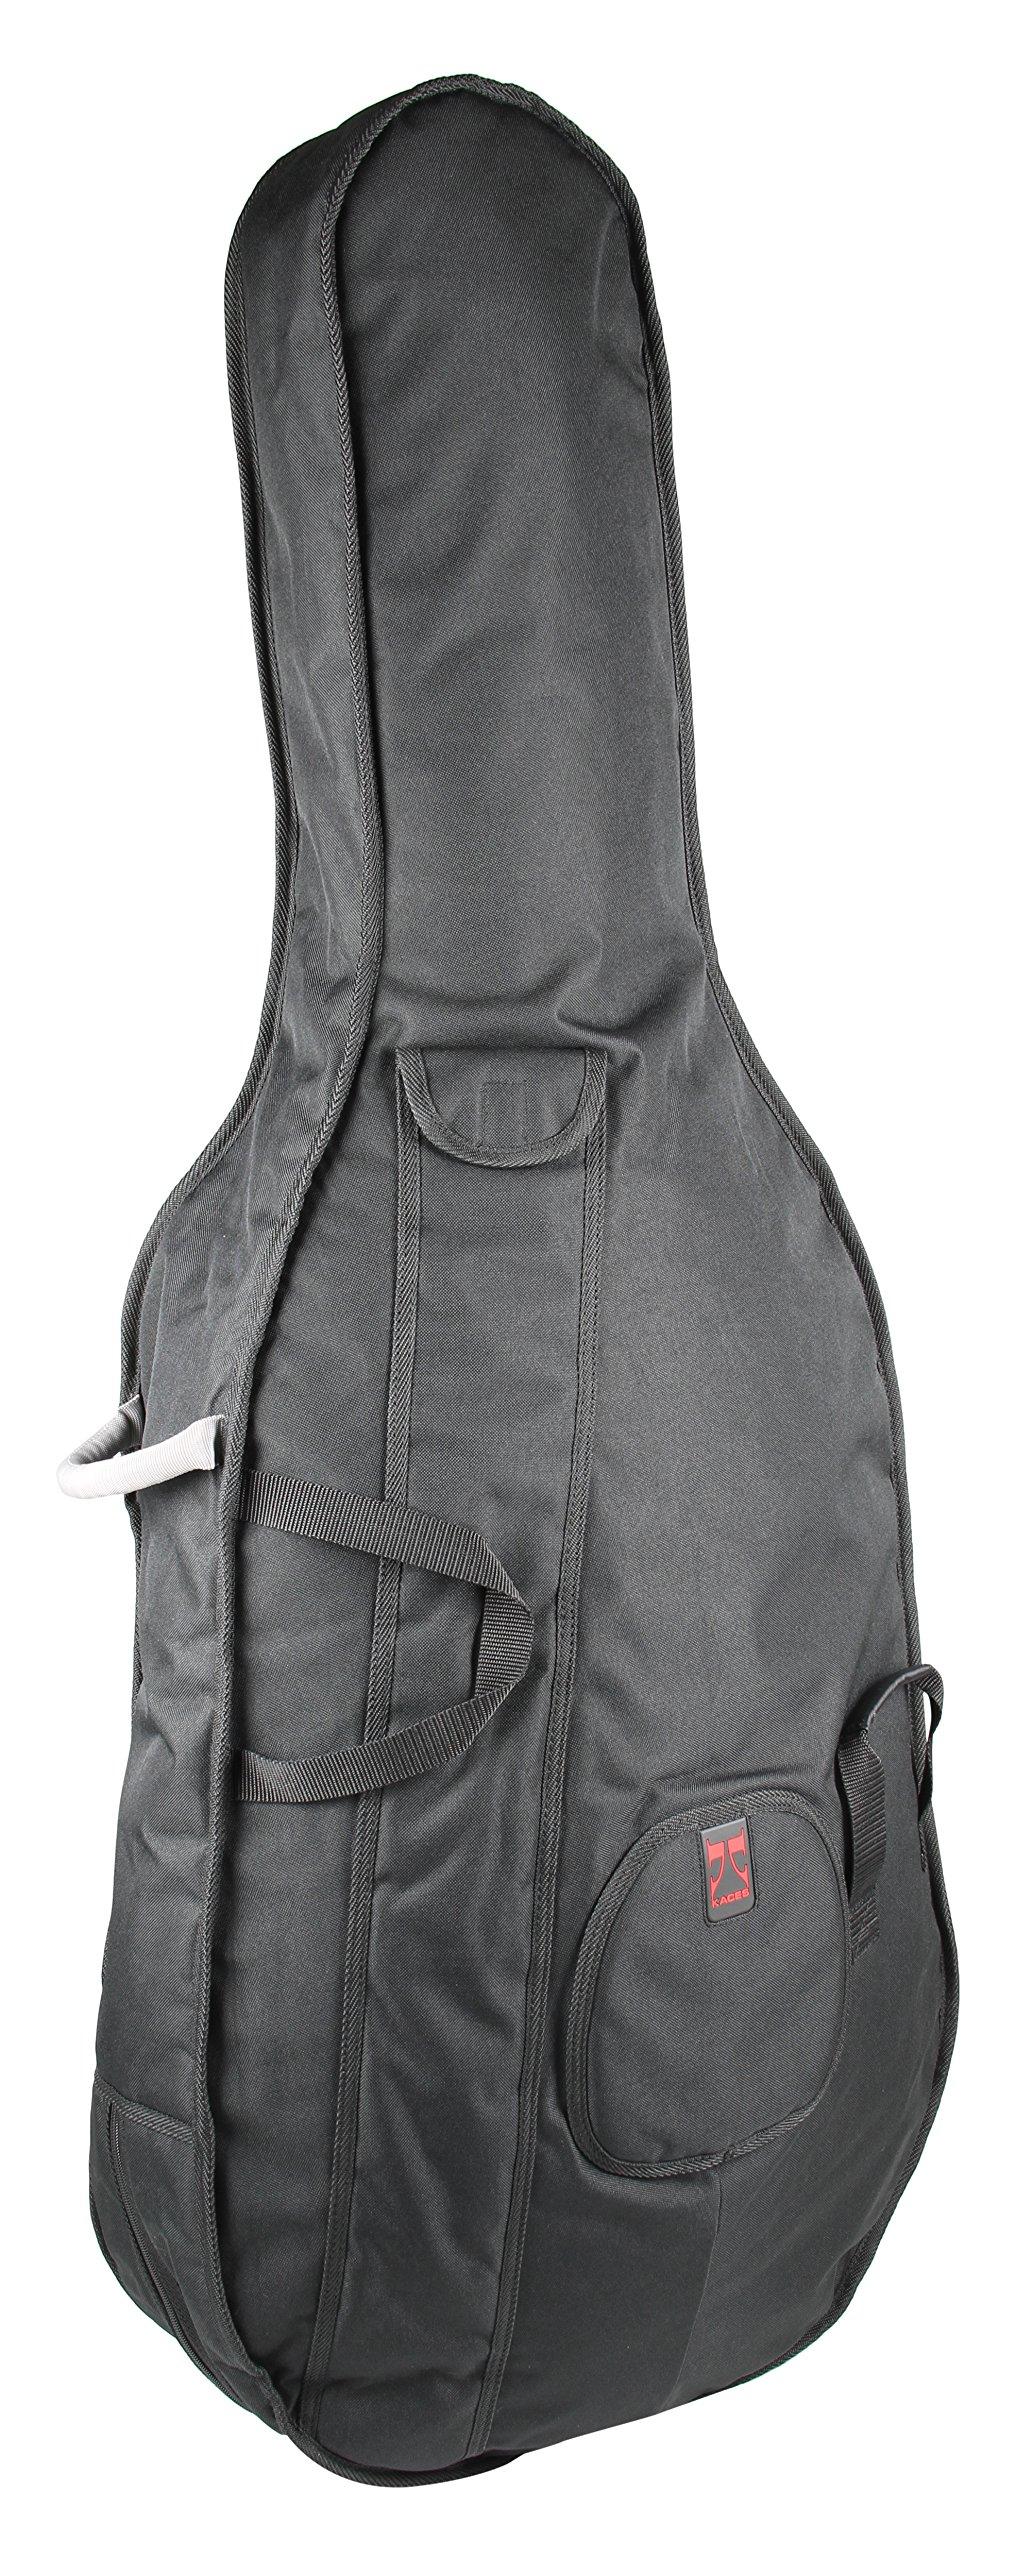 Kaces UKCB-1/2 University Series 1/2 Size Cello Bag